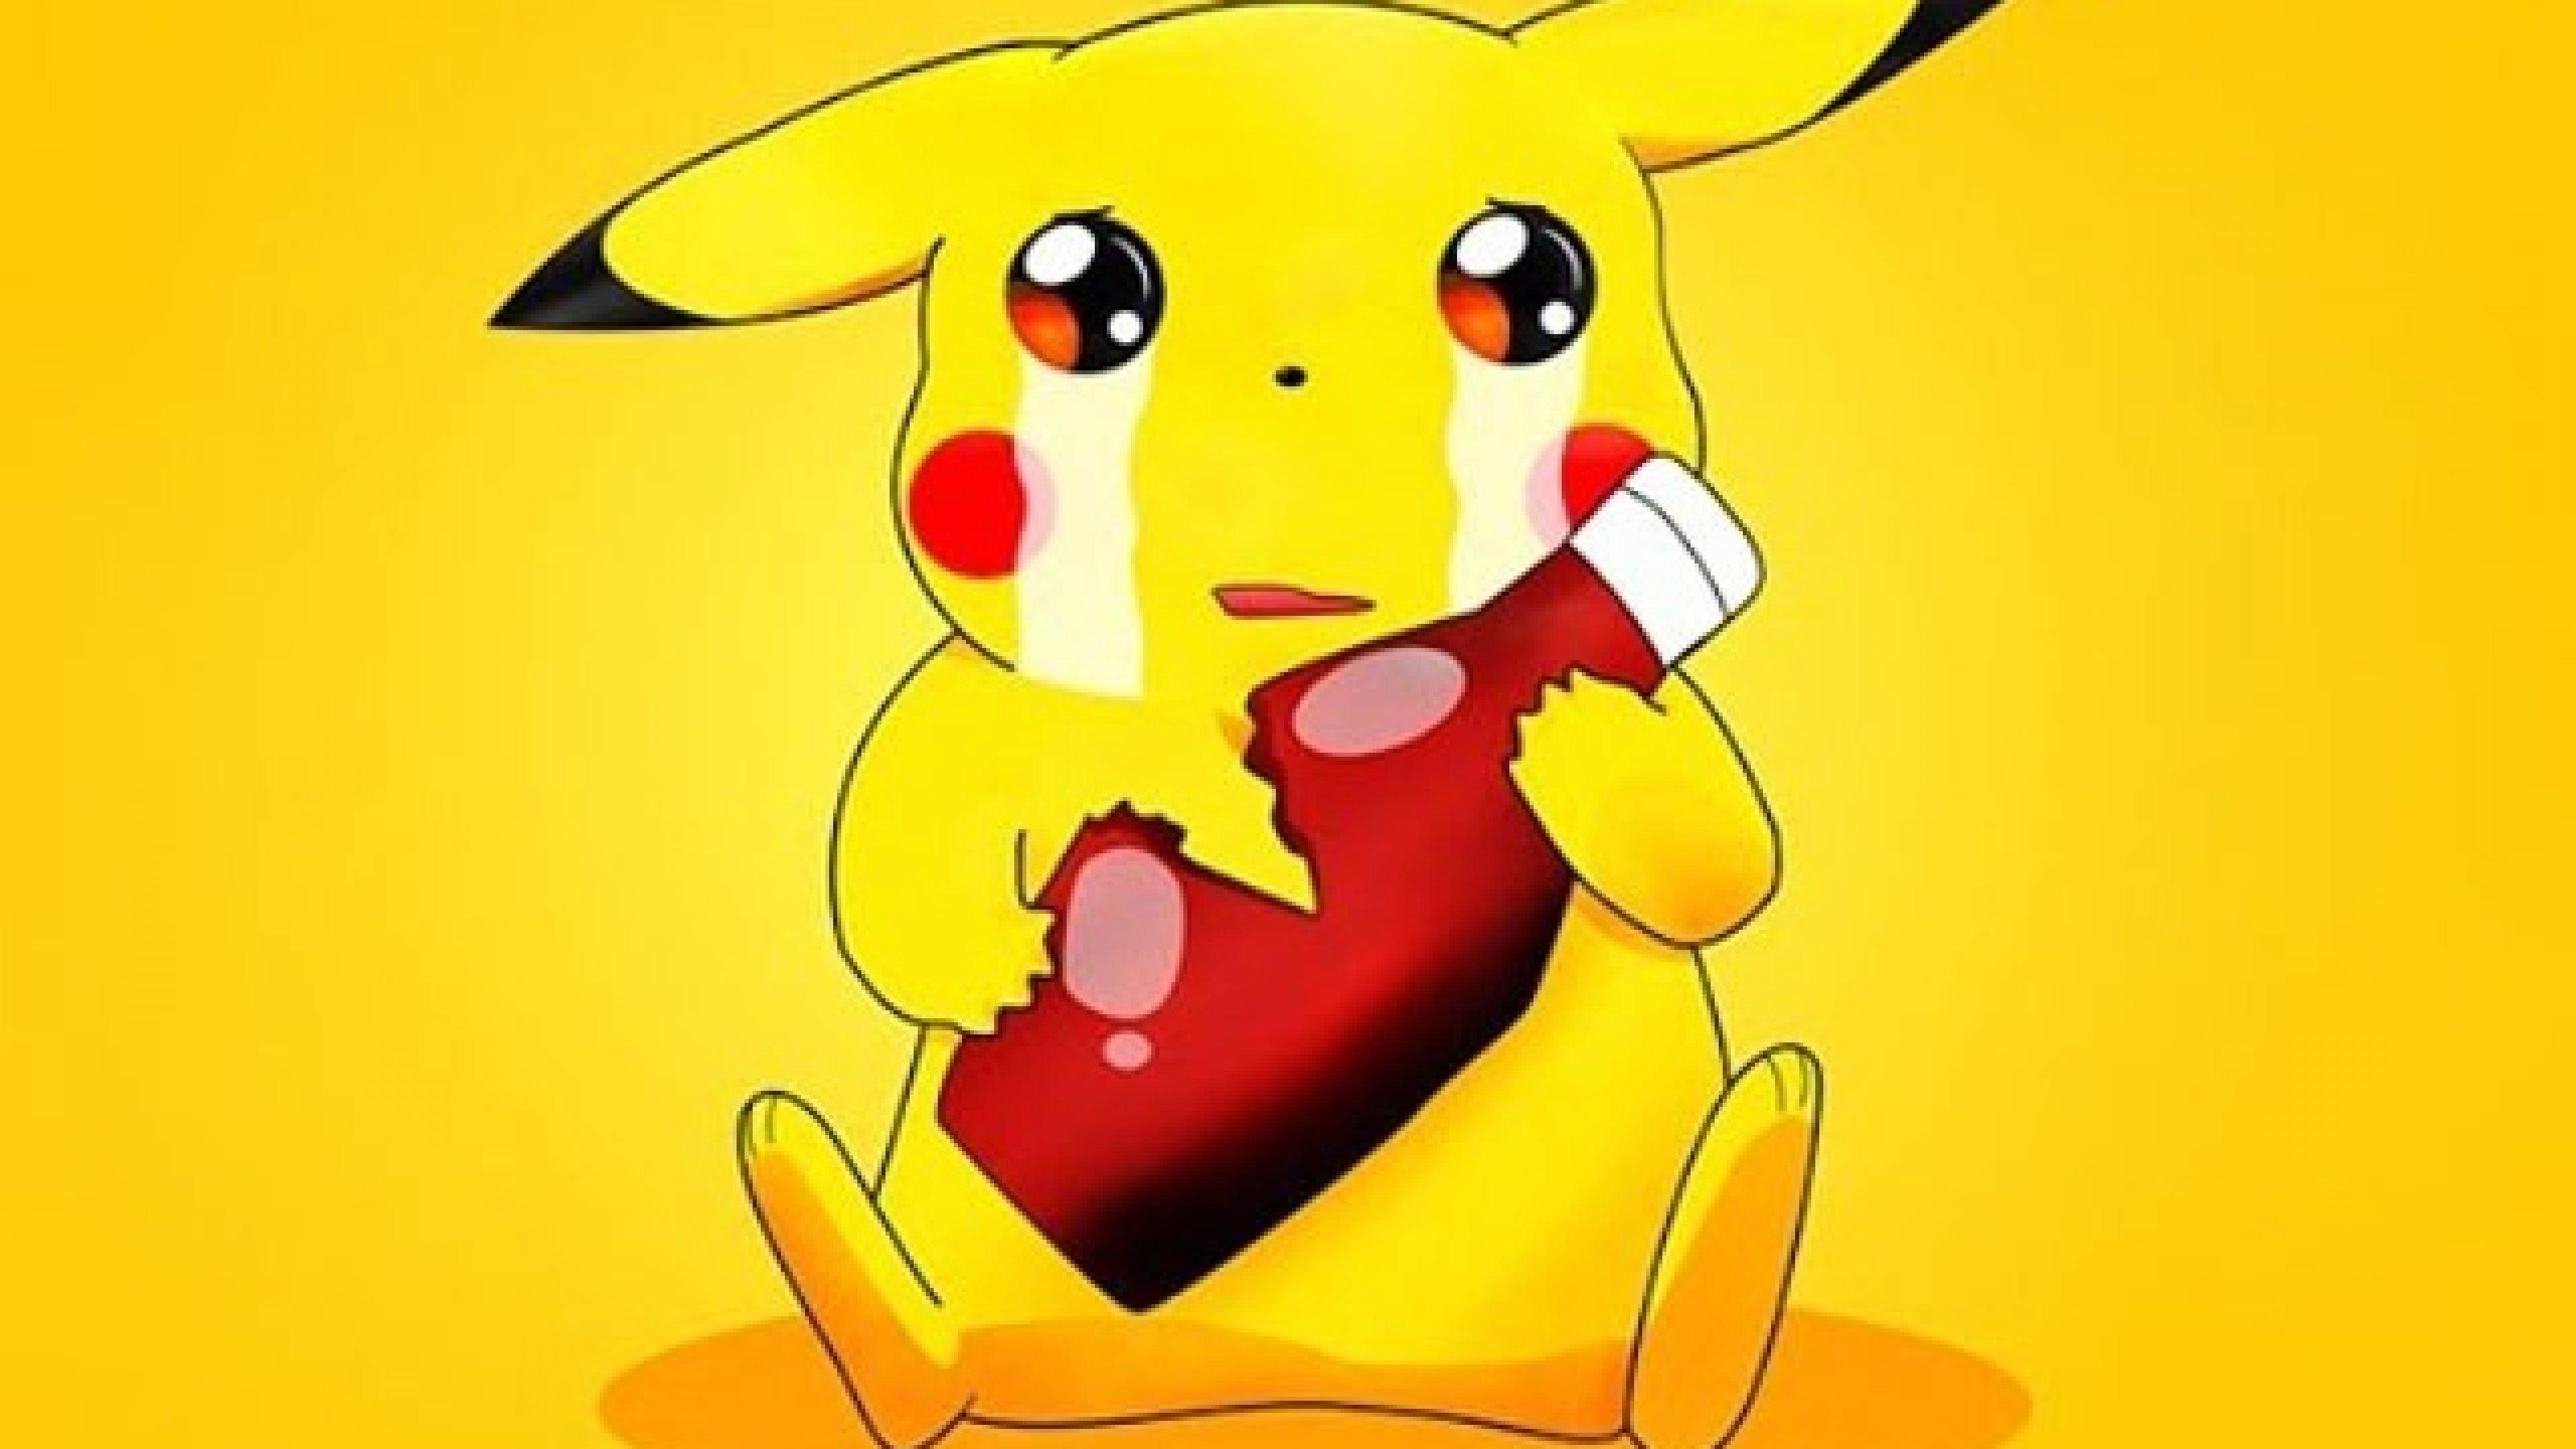 pikachu wallpaper iphone 5